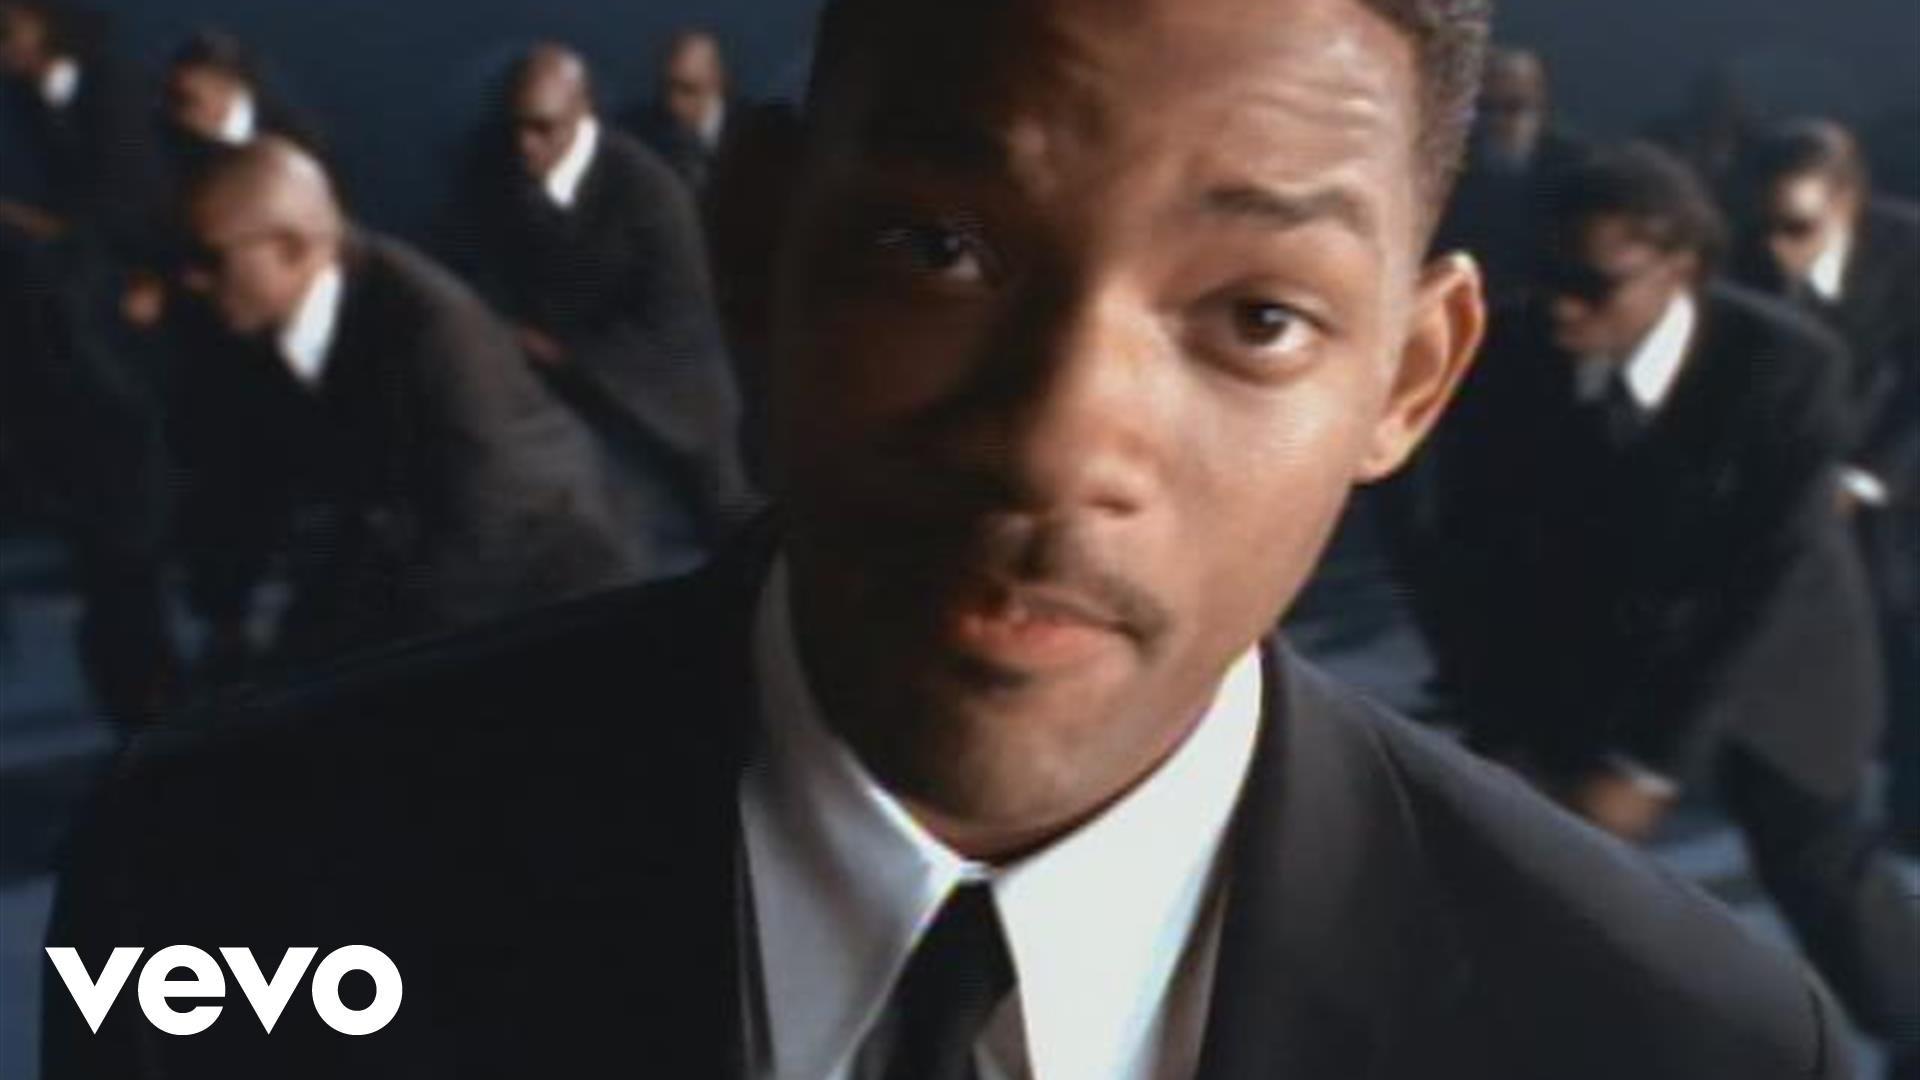 5 major R&B/hip-hop artists who never performed at the MTV VMAs